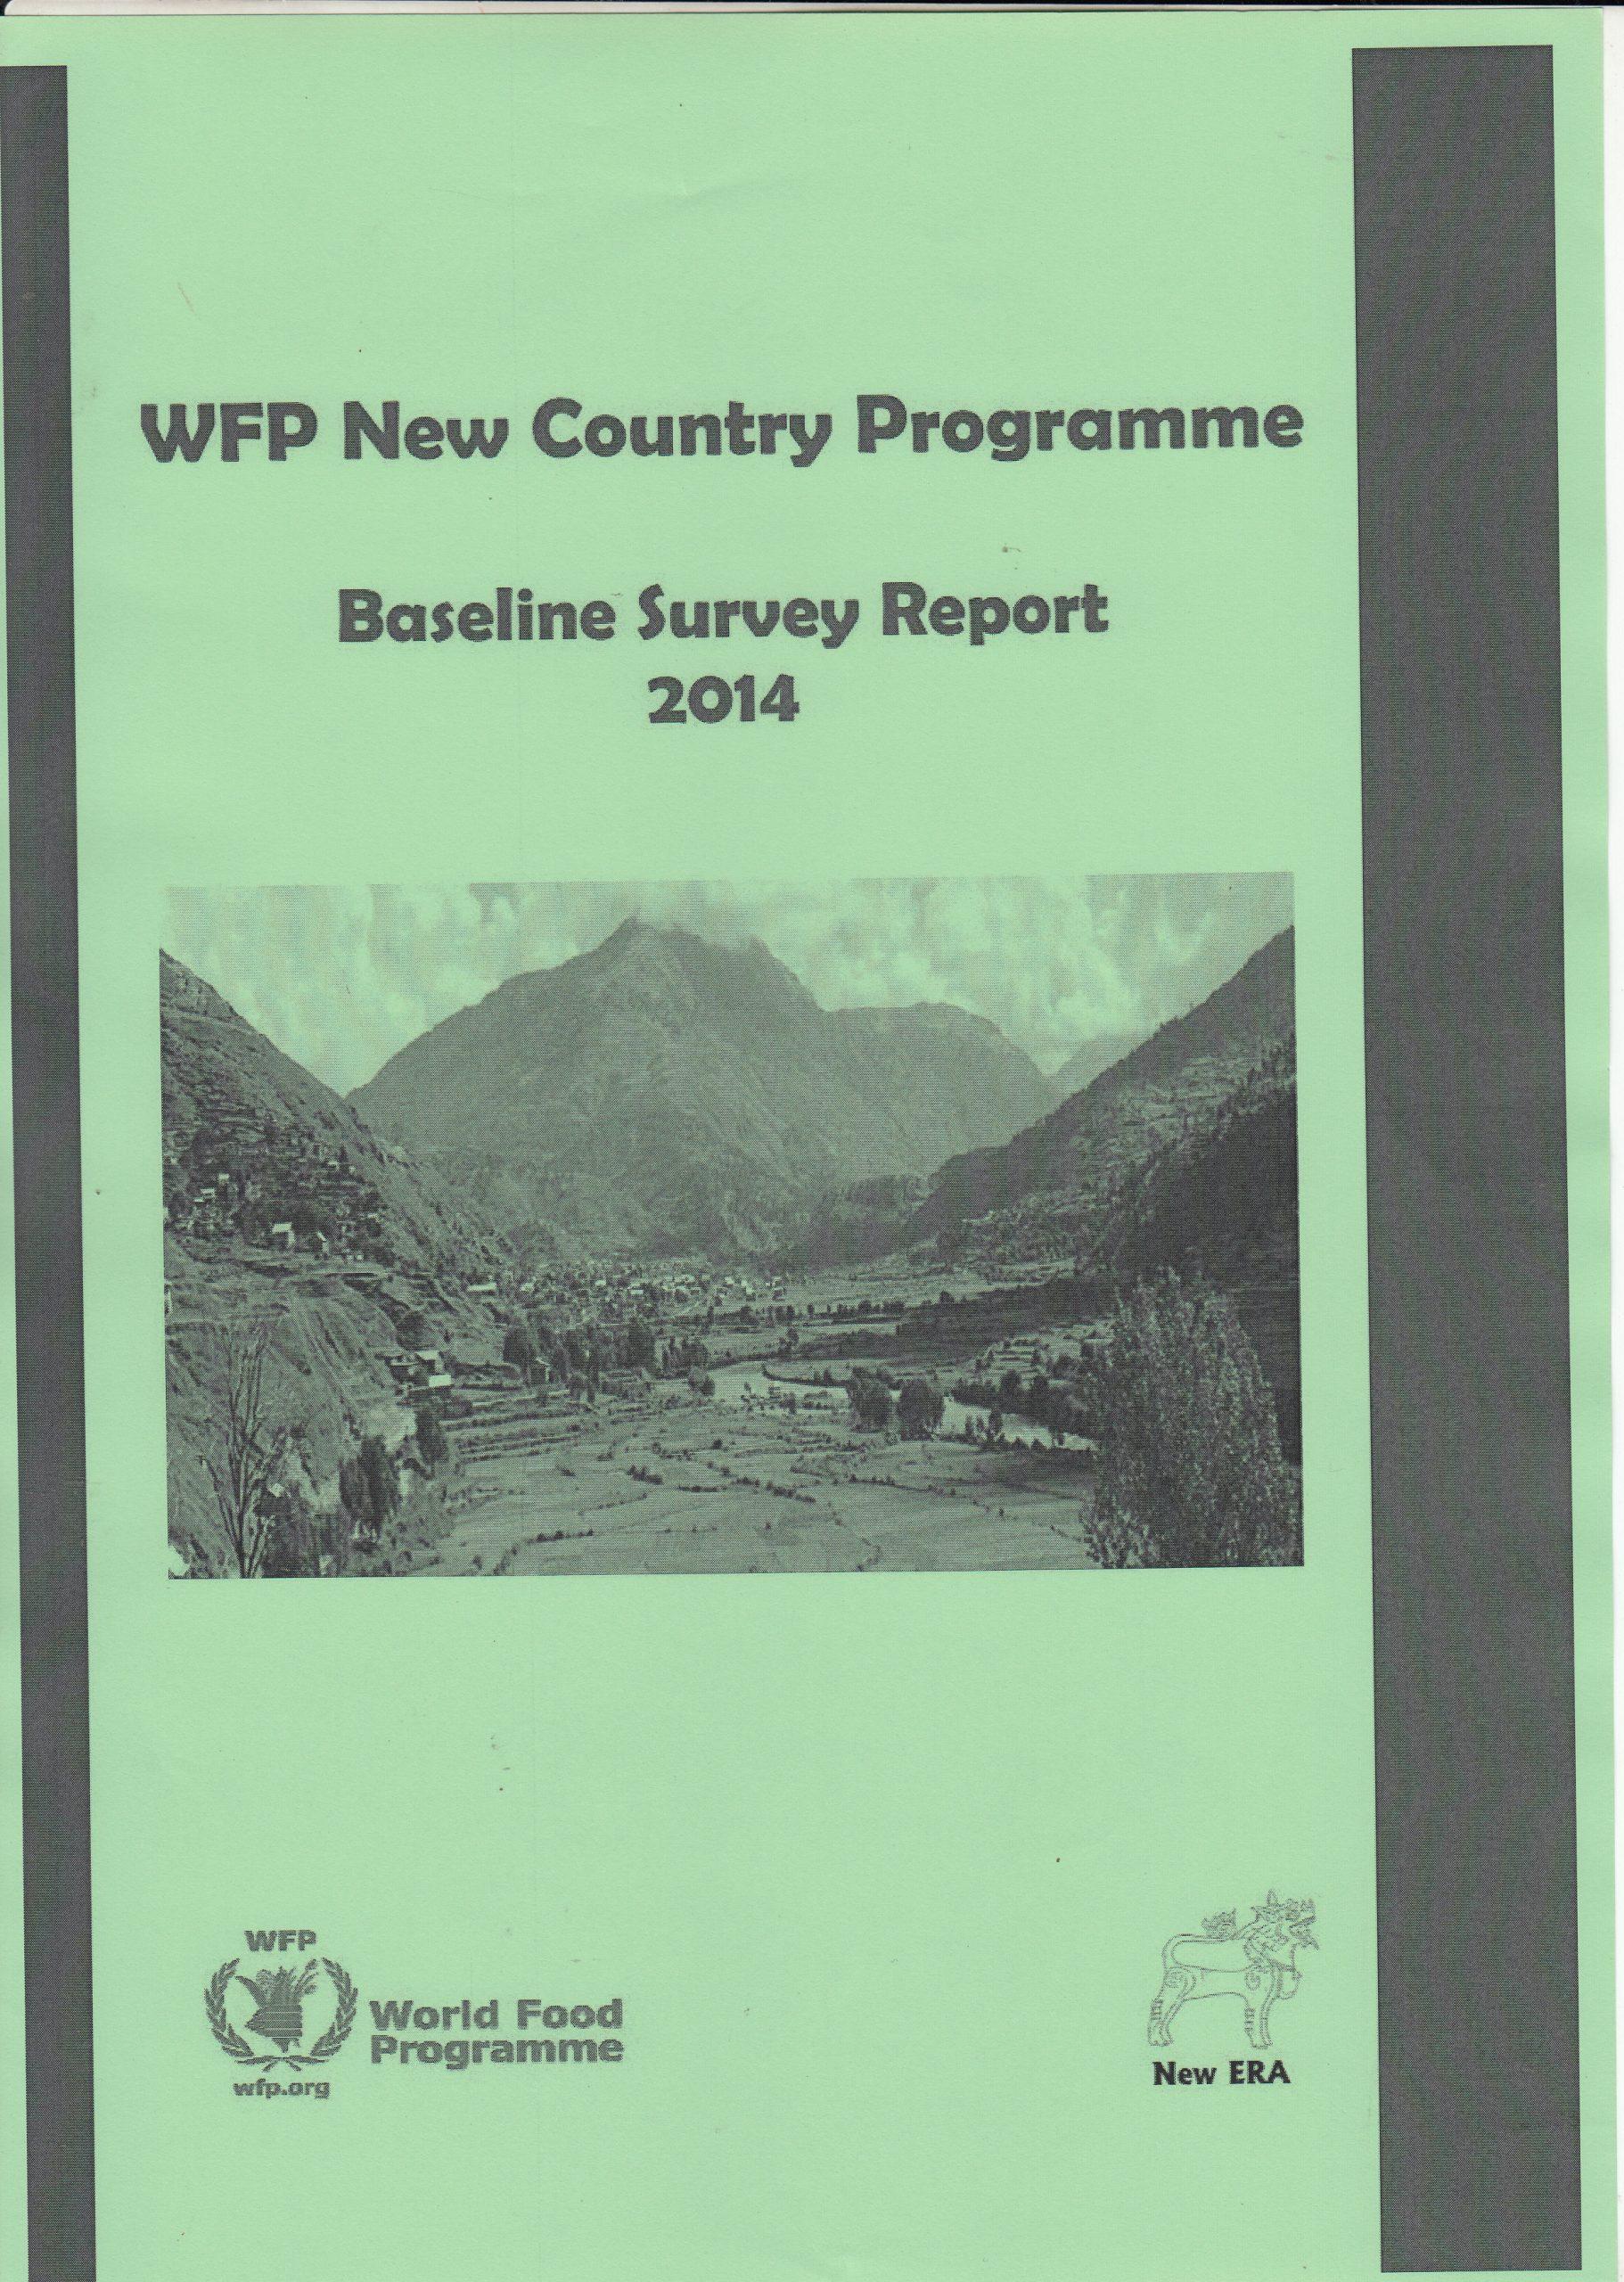 WFP New Country Program (2013-2017) -Baseline Survey